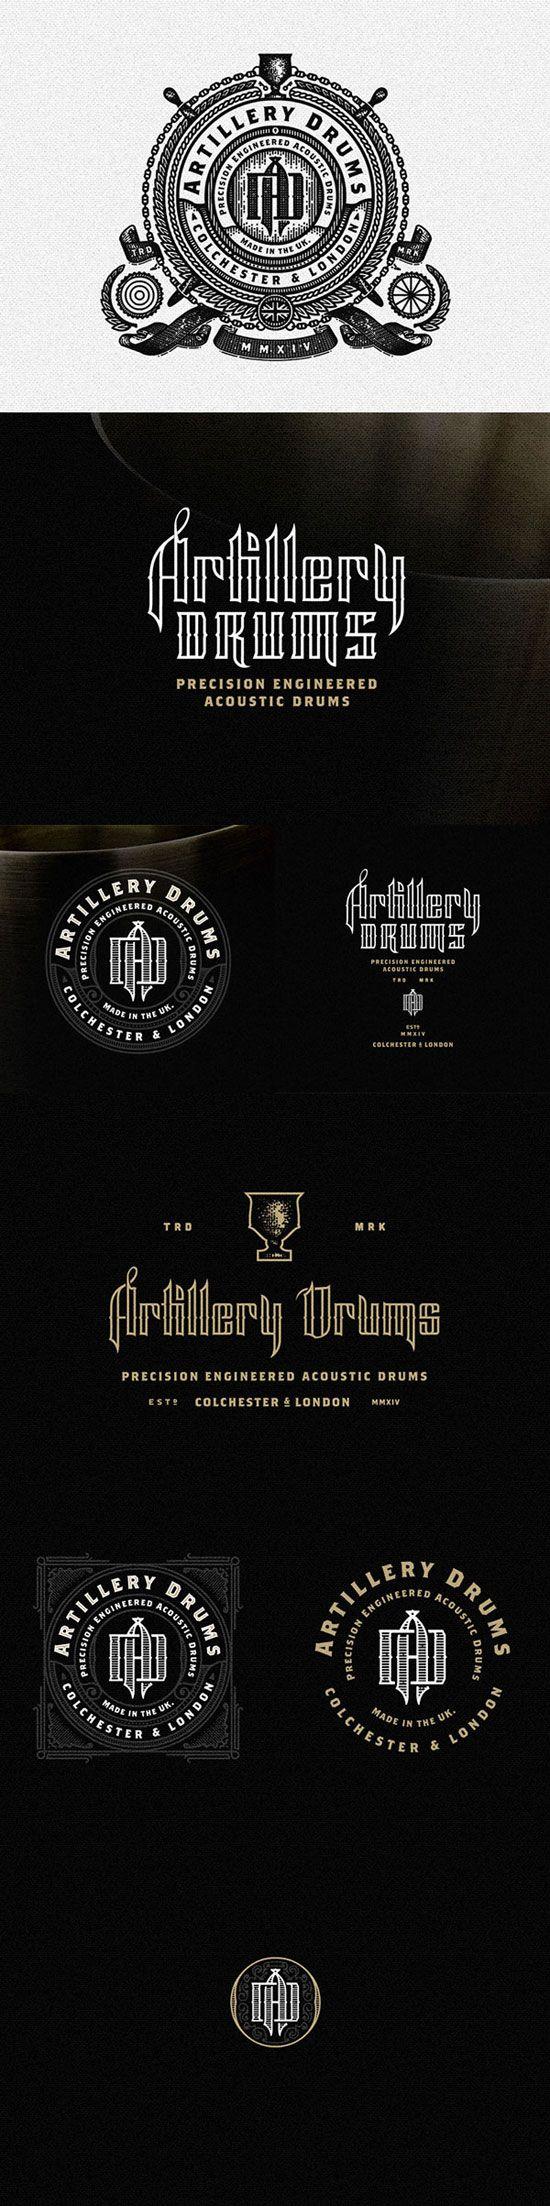 Beautiful and Very Details Logo Designs by Joe White | iBrandStudio